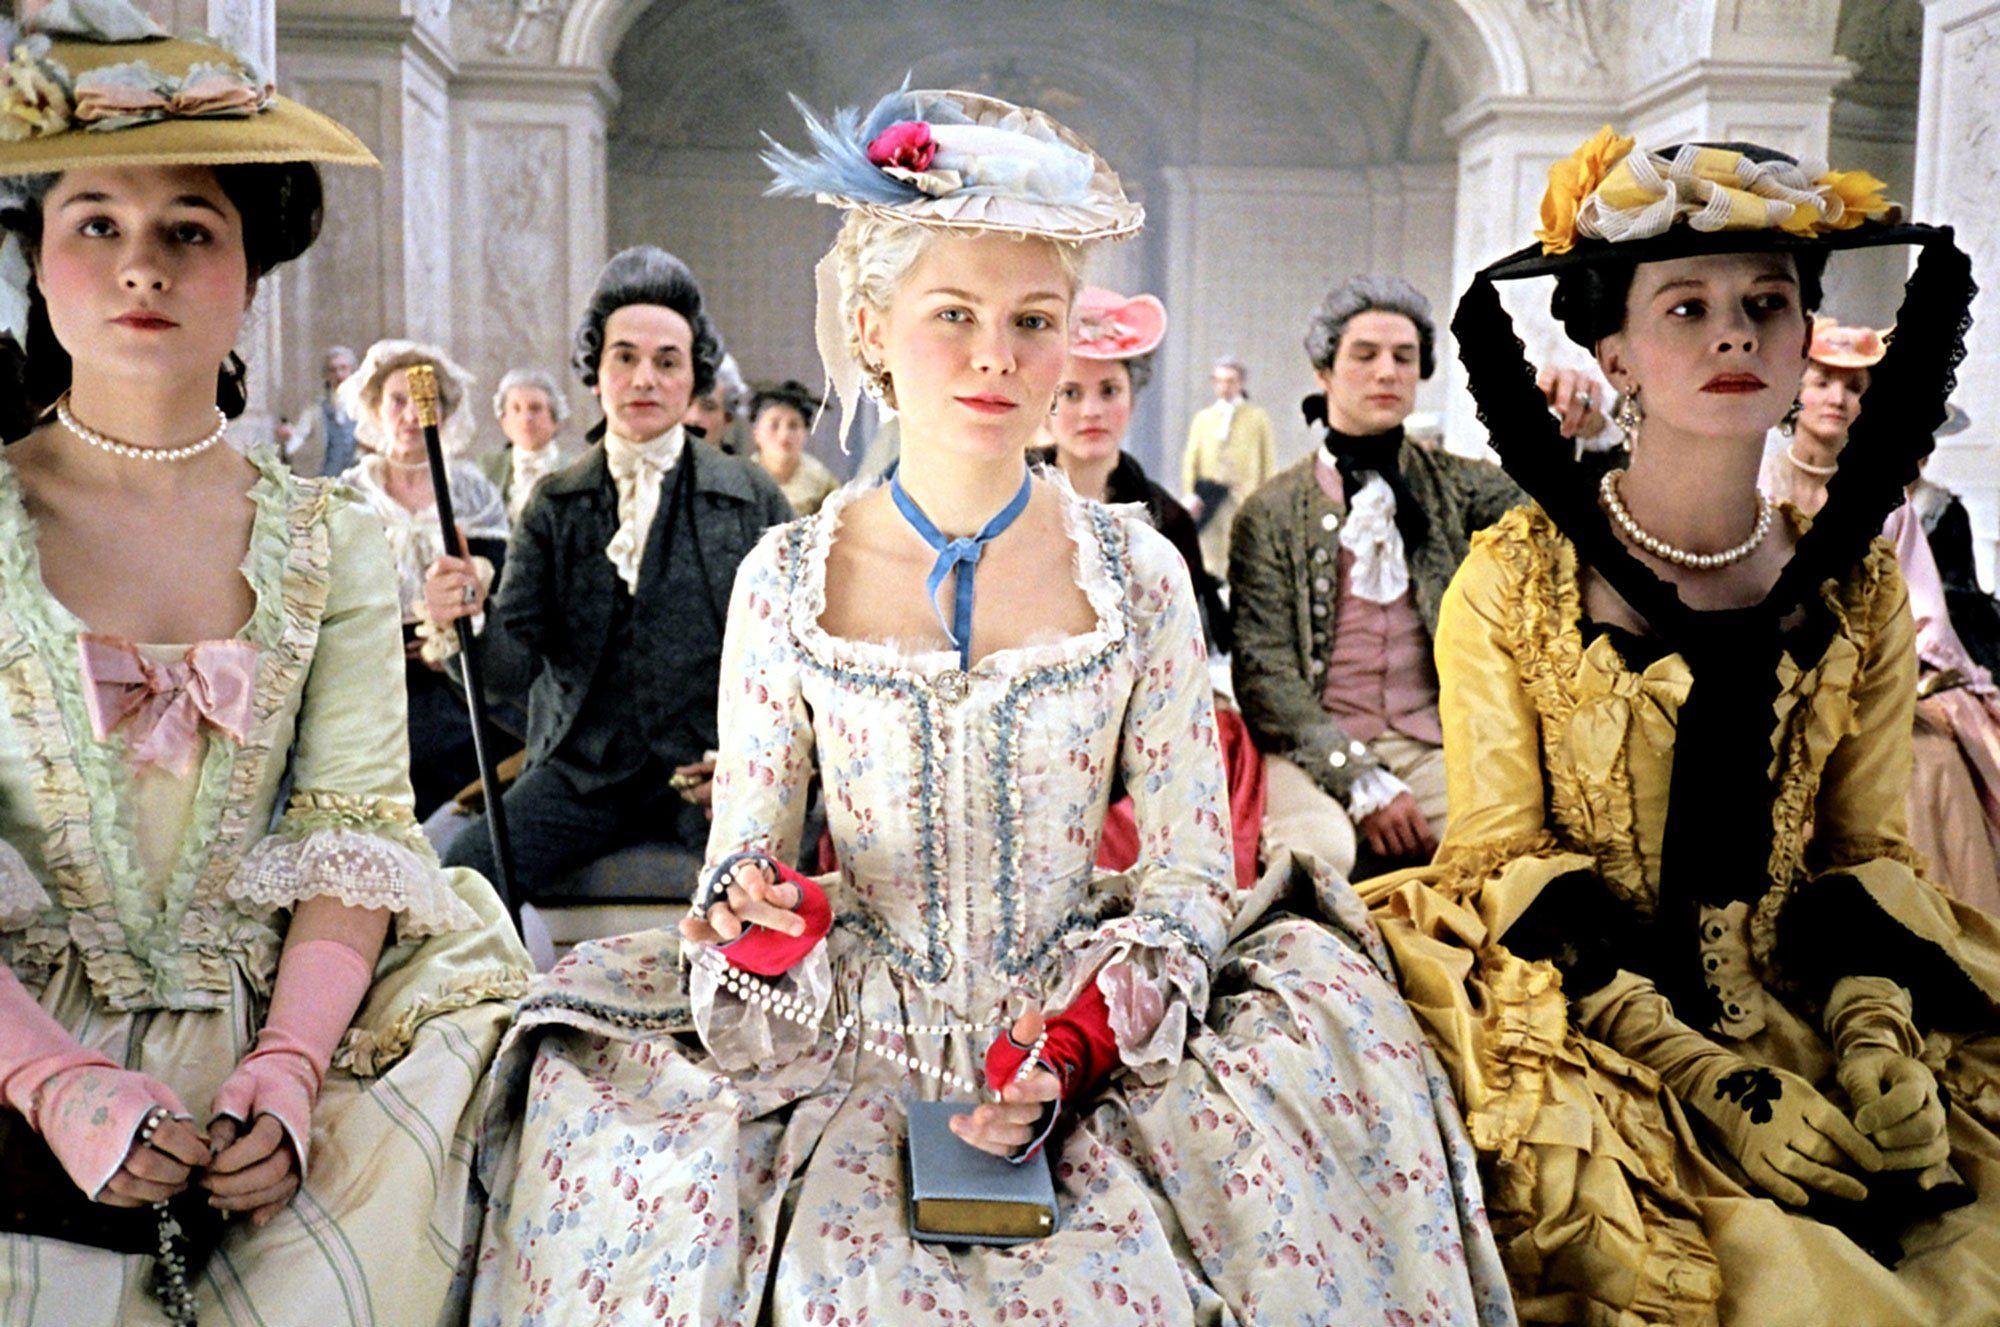 Marie Antoinette, 2006 - Milena Canonero's sumptuous gowns for Sofia Coppola's Marie Antoinette won her the 2006 prize.